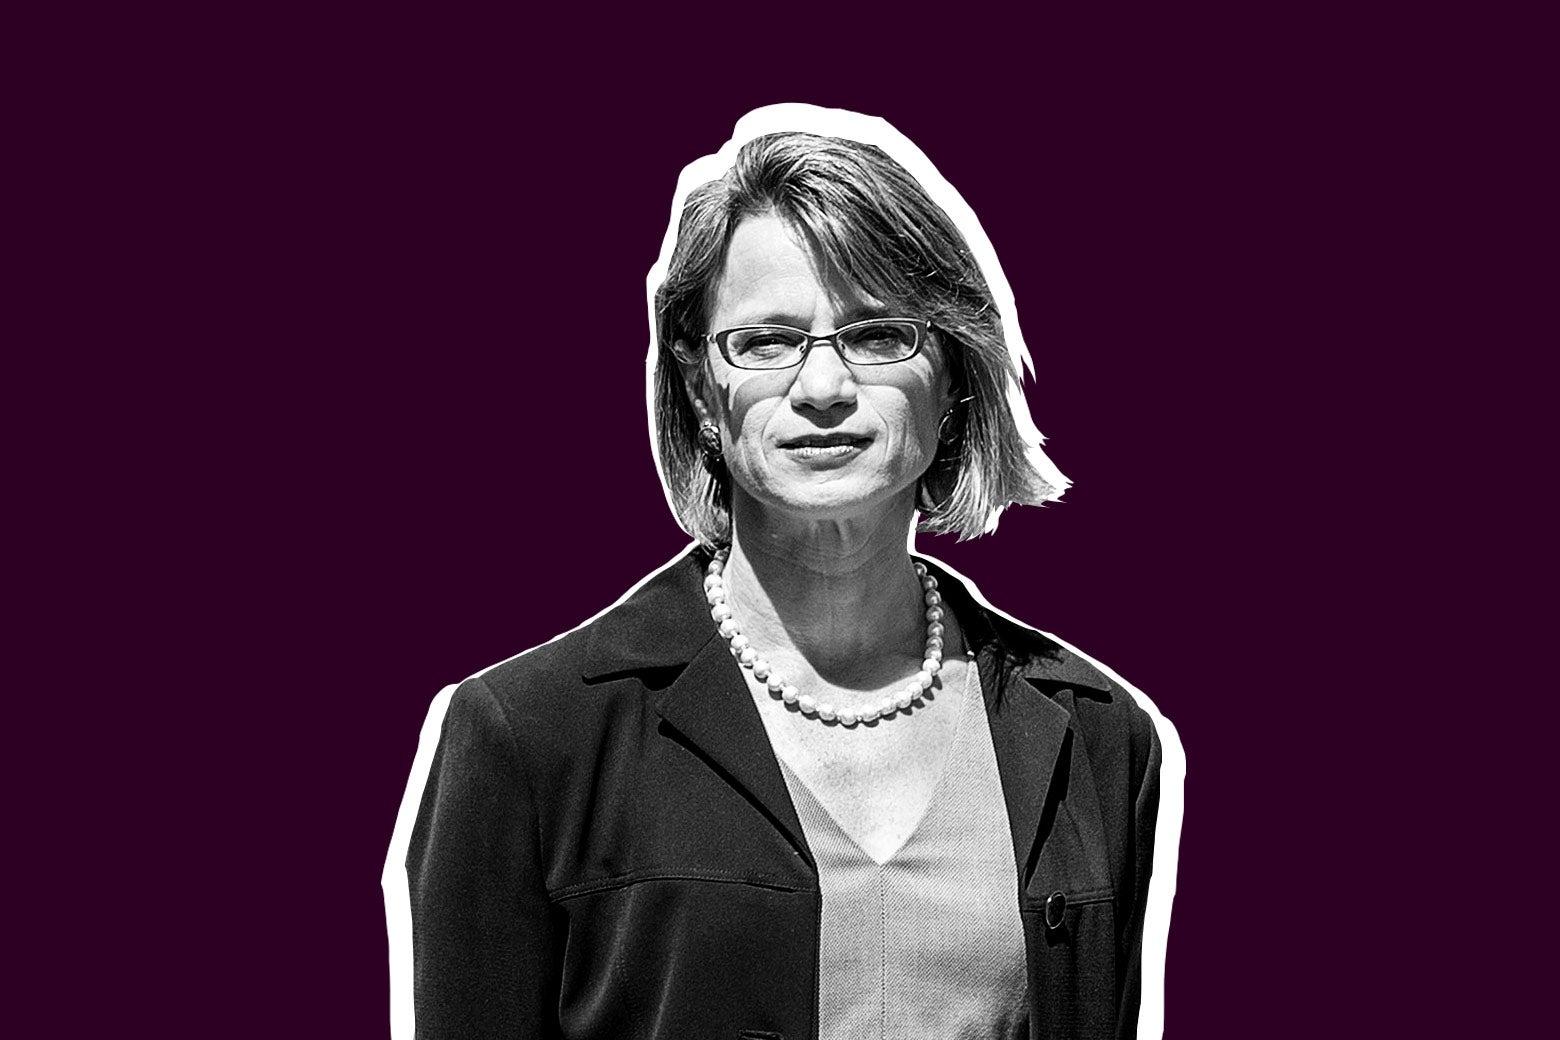 Judge Nina Pillard against a purple background.